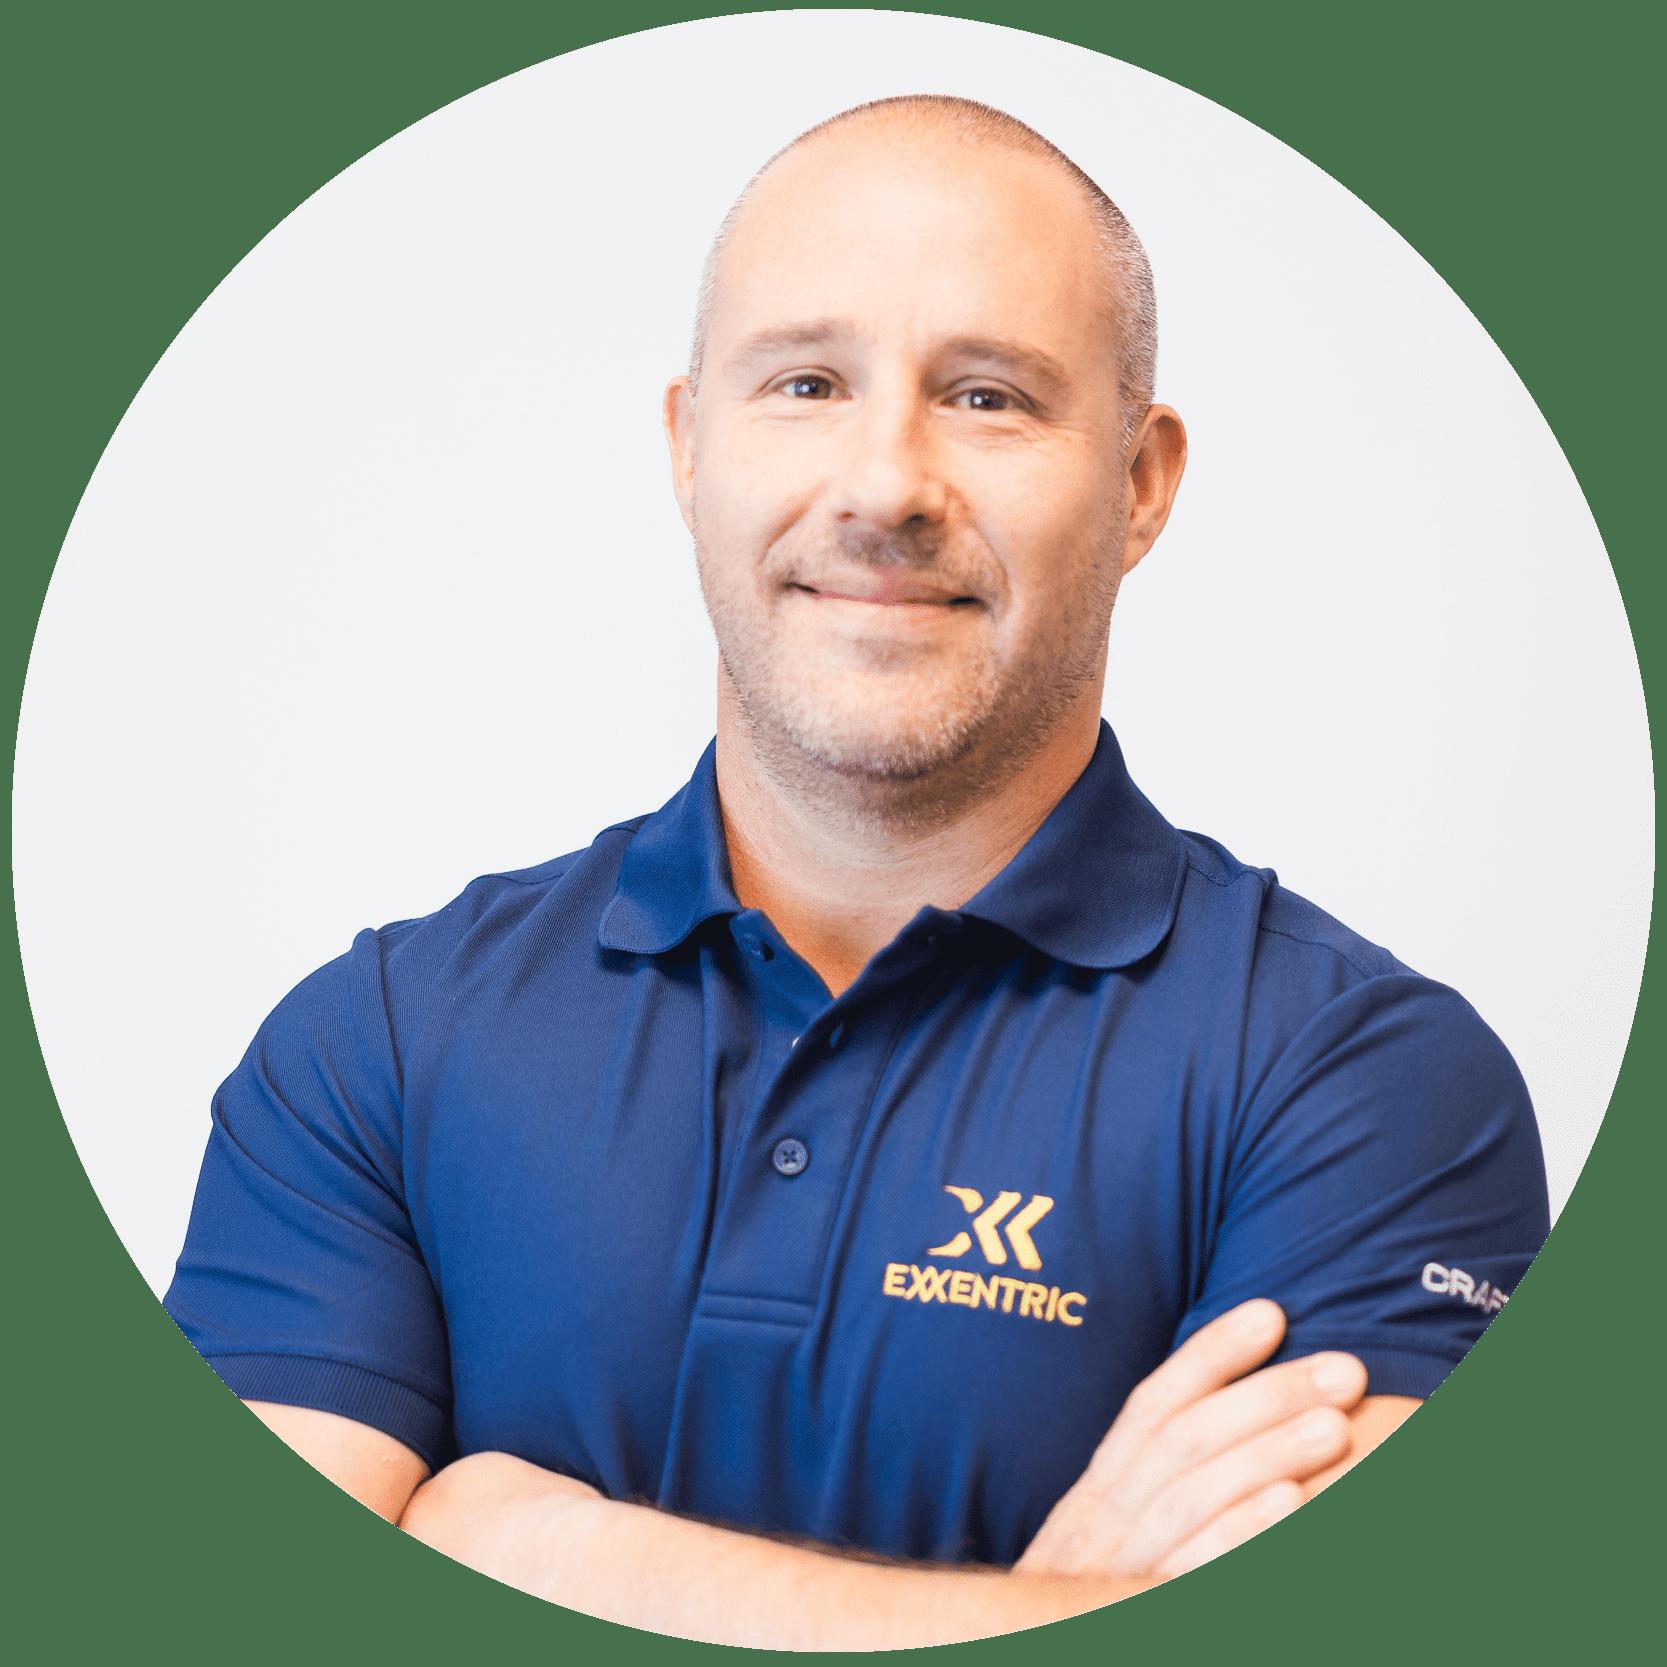 Fredrik Correa CEO & Founder of Exxentric